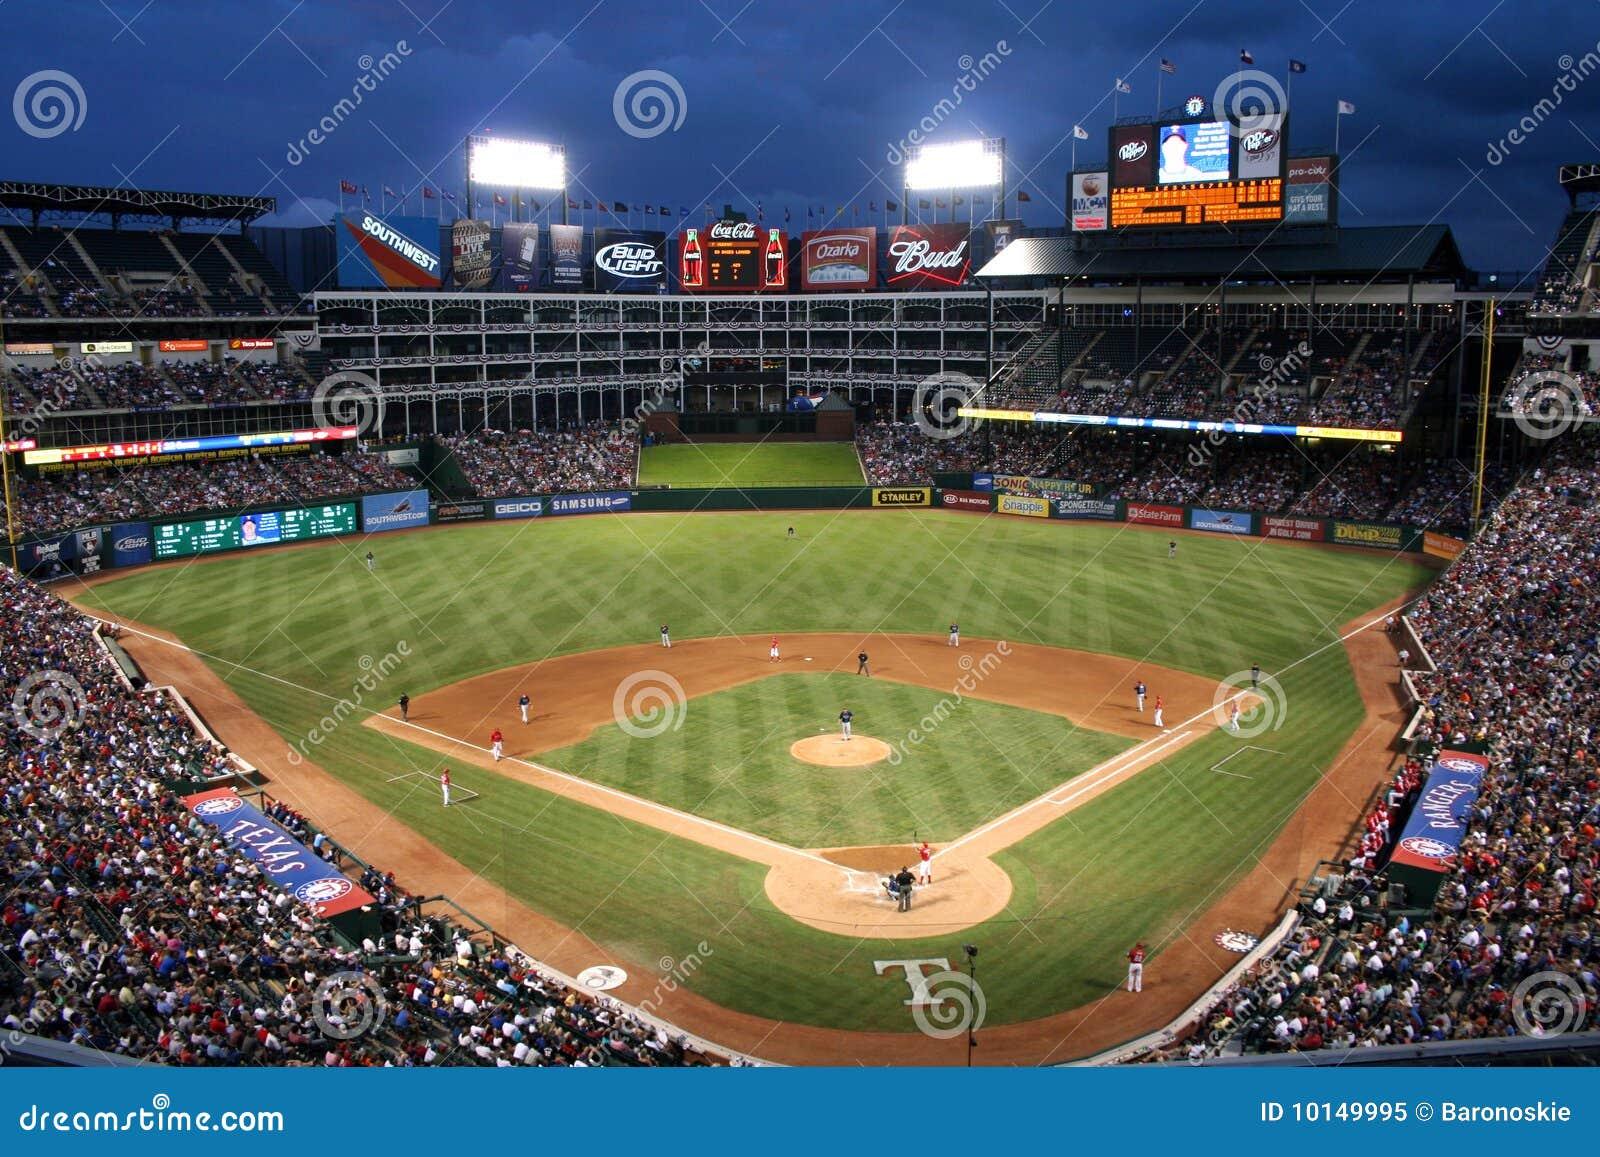 texas rangers baseball game at night editorial image